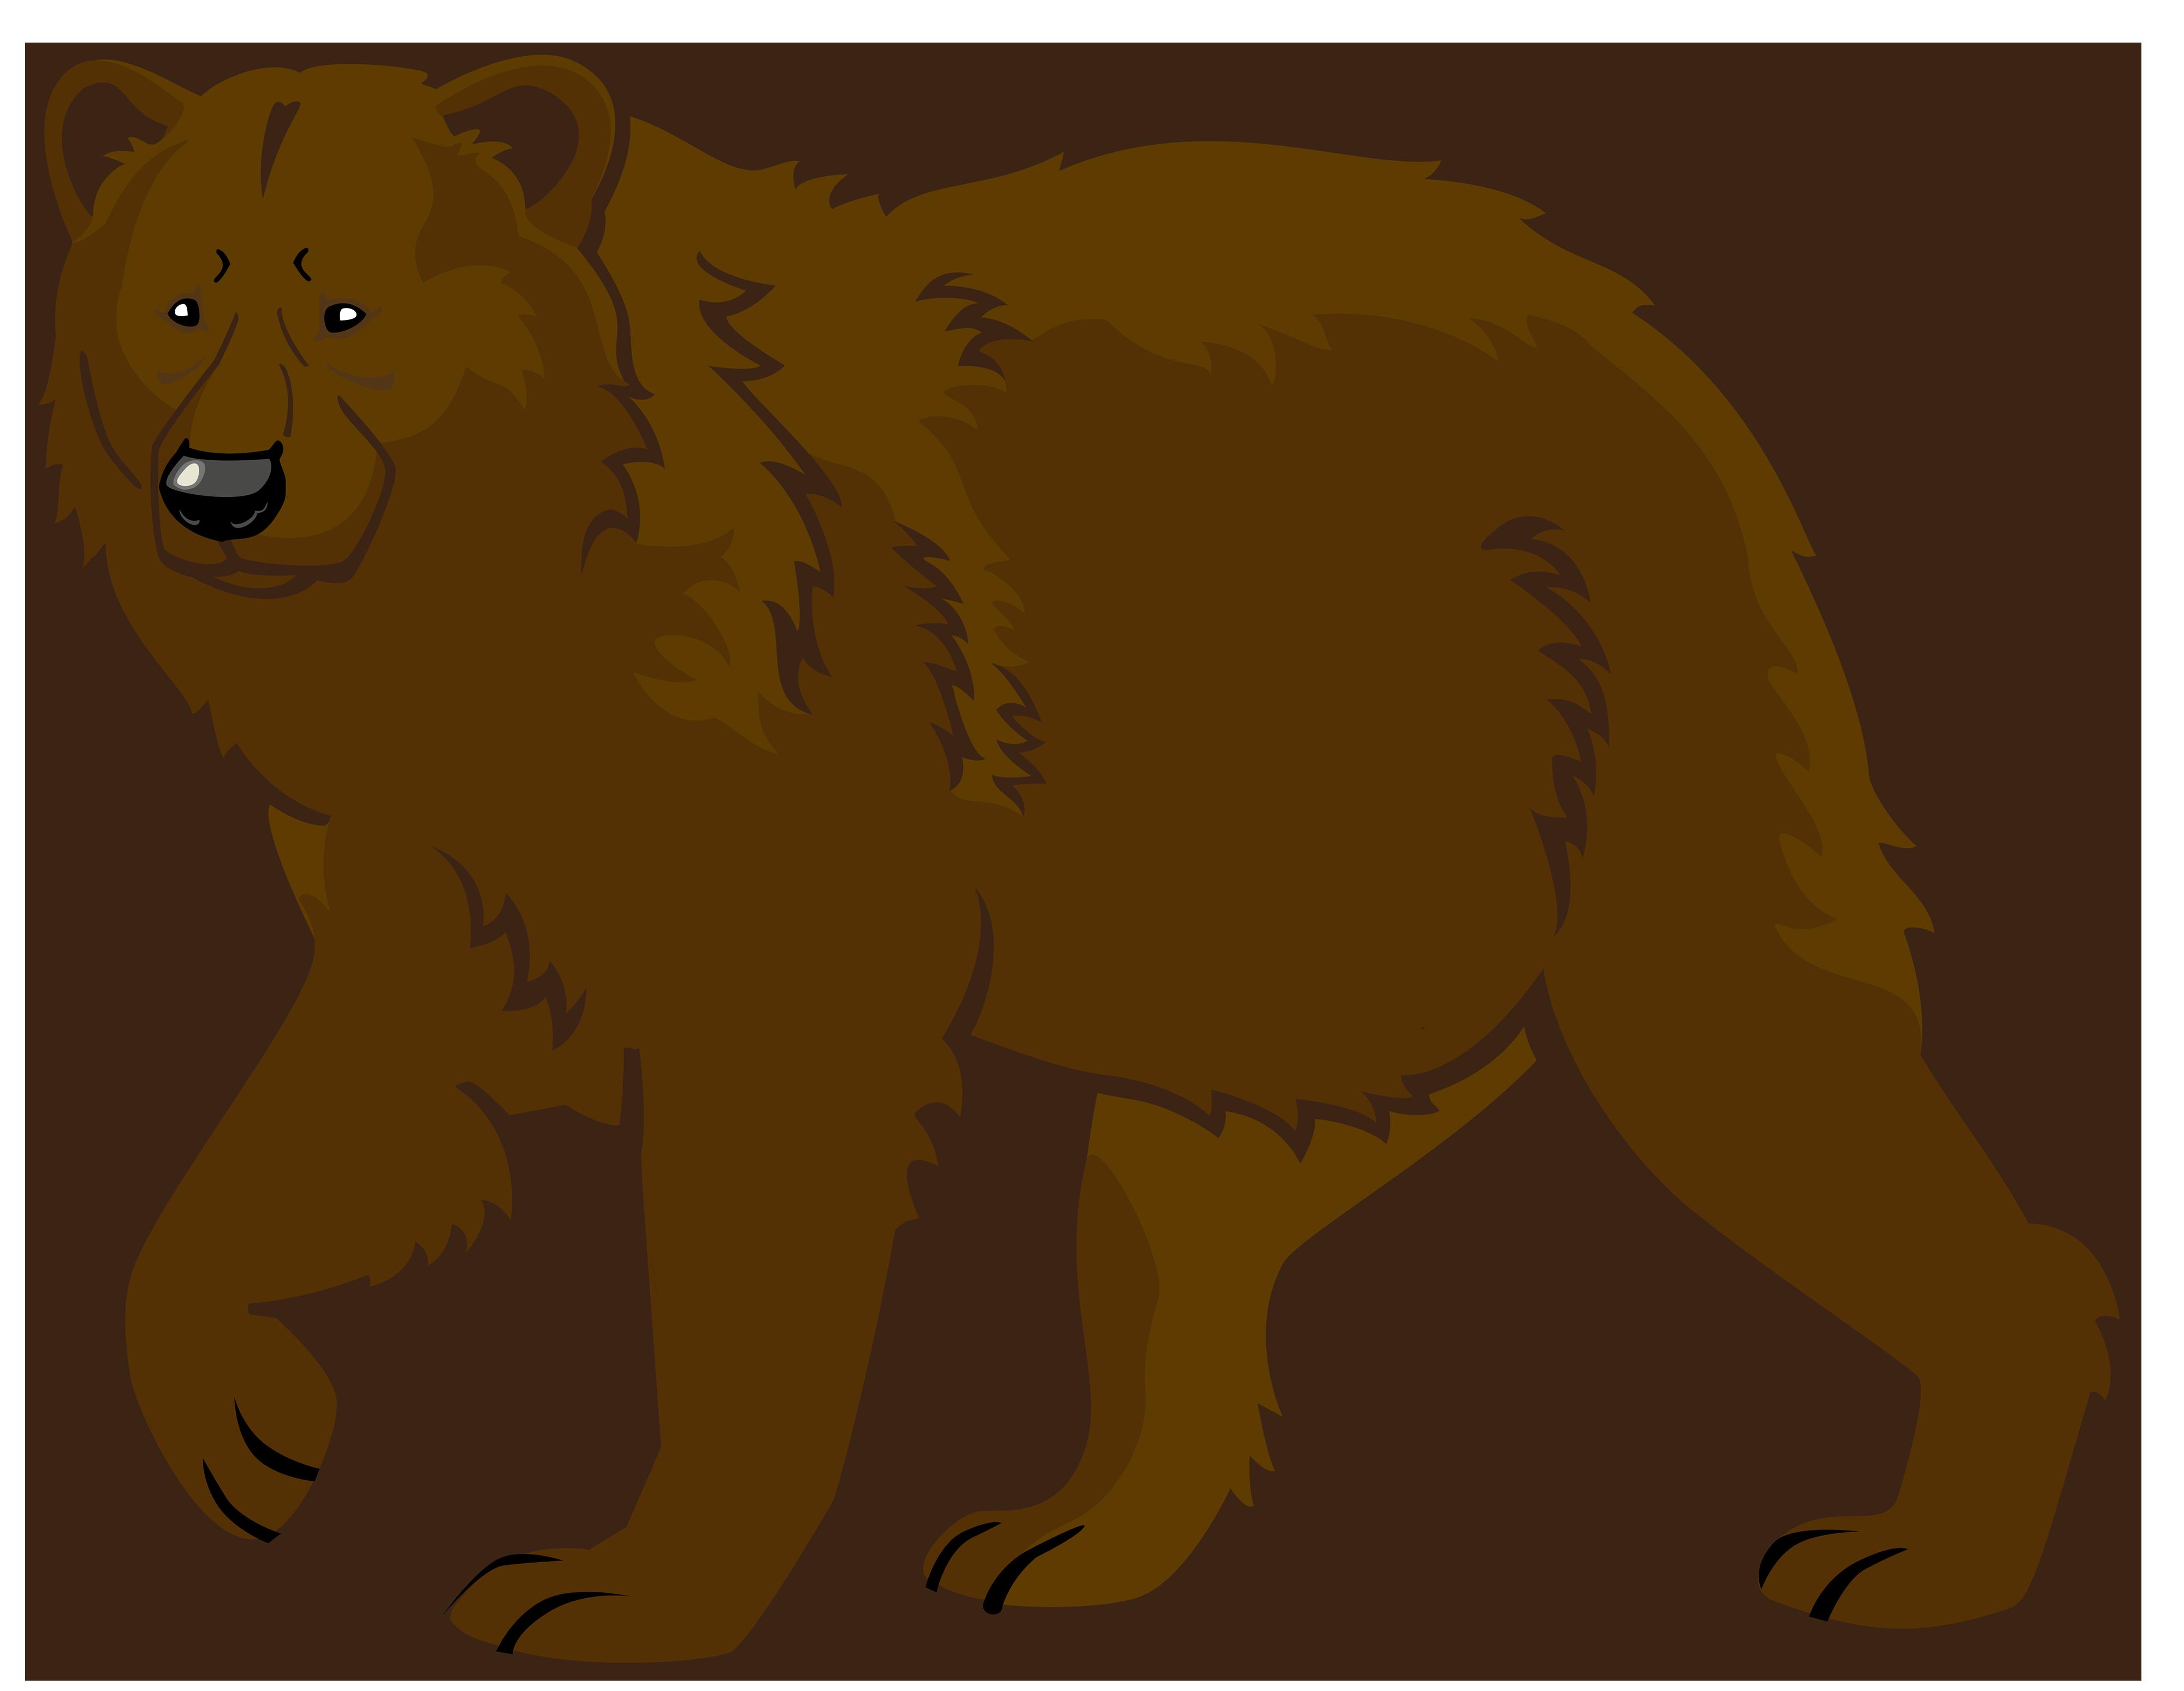 Bear clipart #2, Download drawings